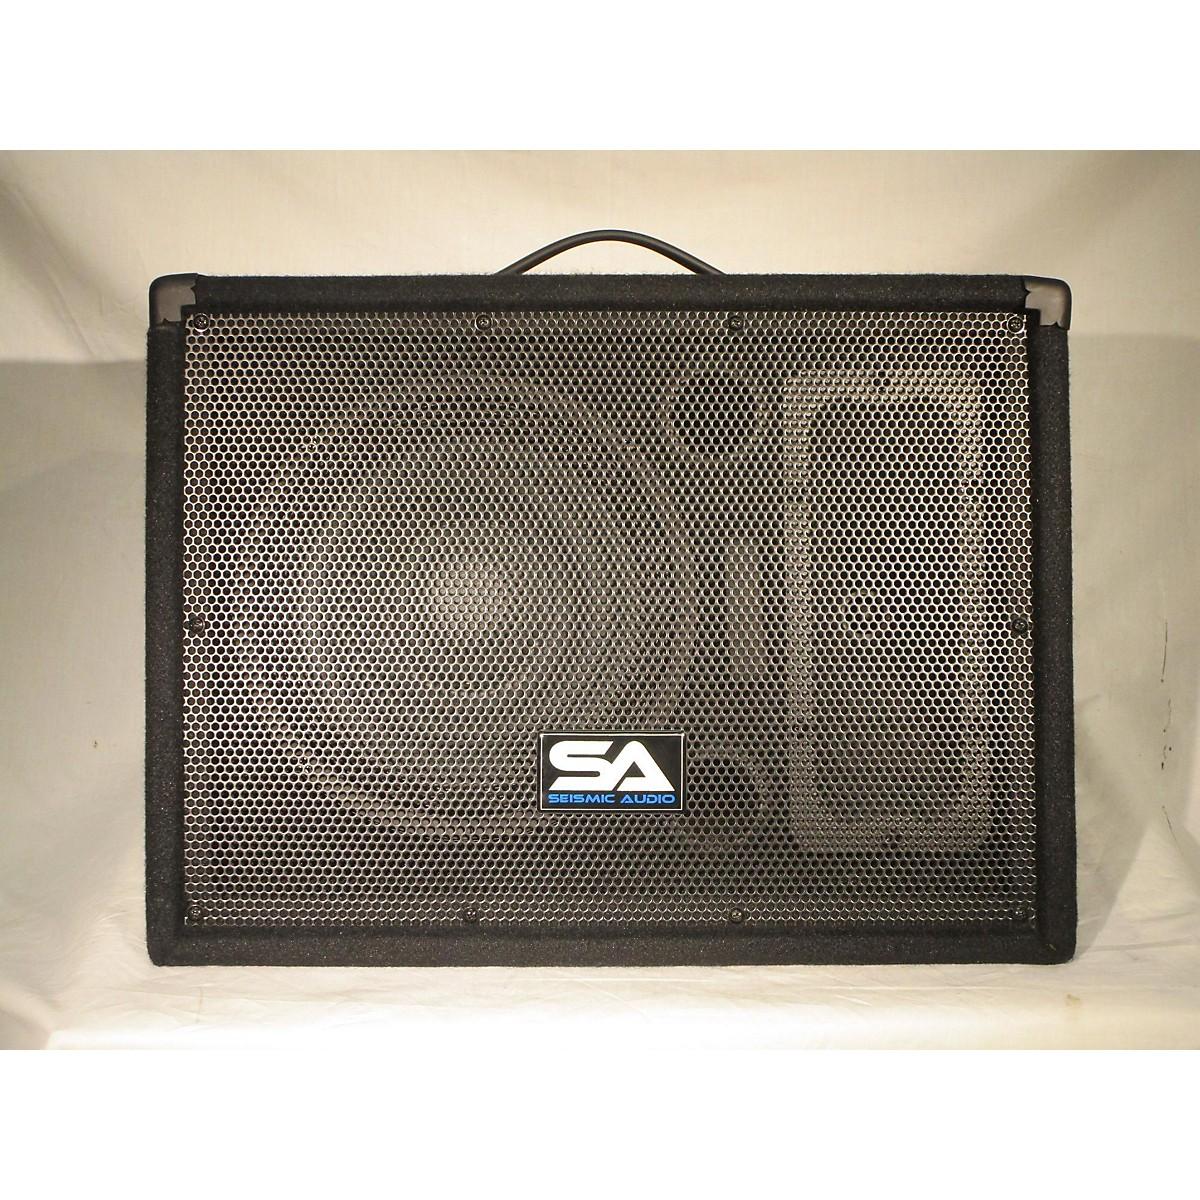 Seismic Audio SA10M.3 Unpowered Speaker